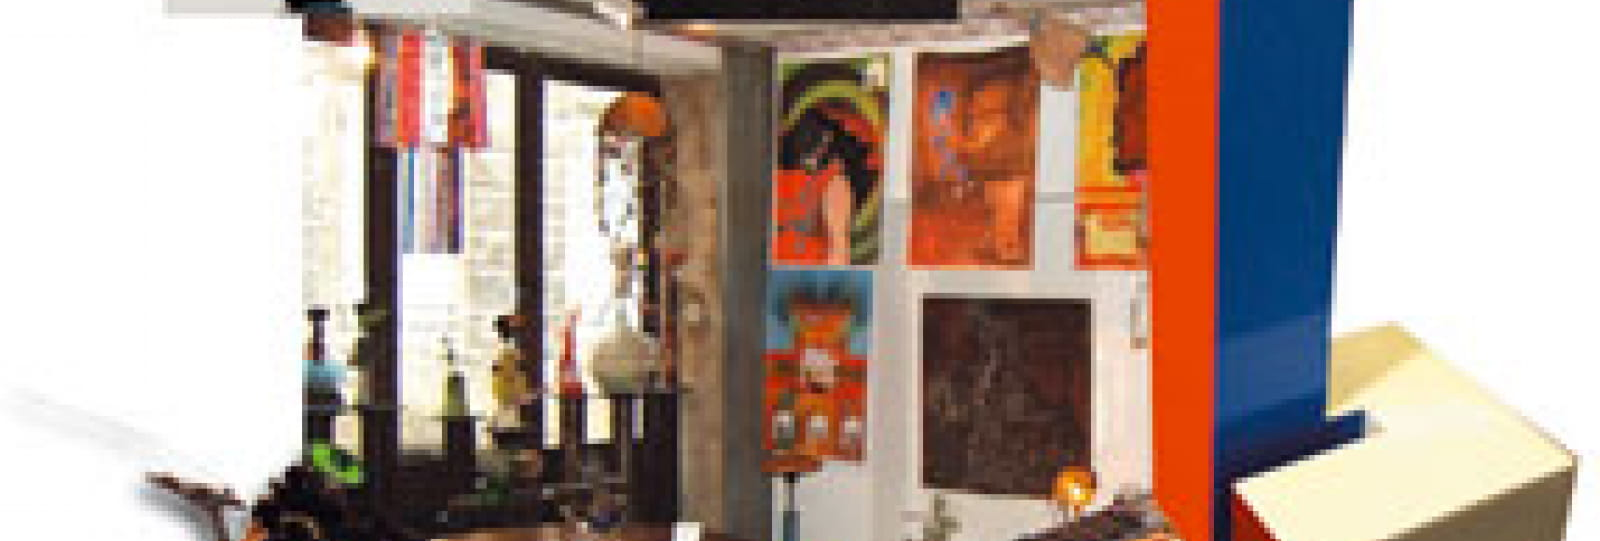 Atelier-Galerie Art Zone